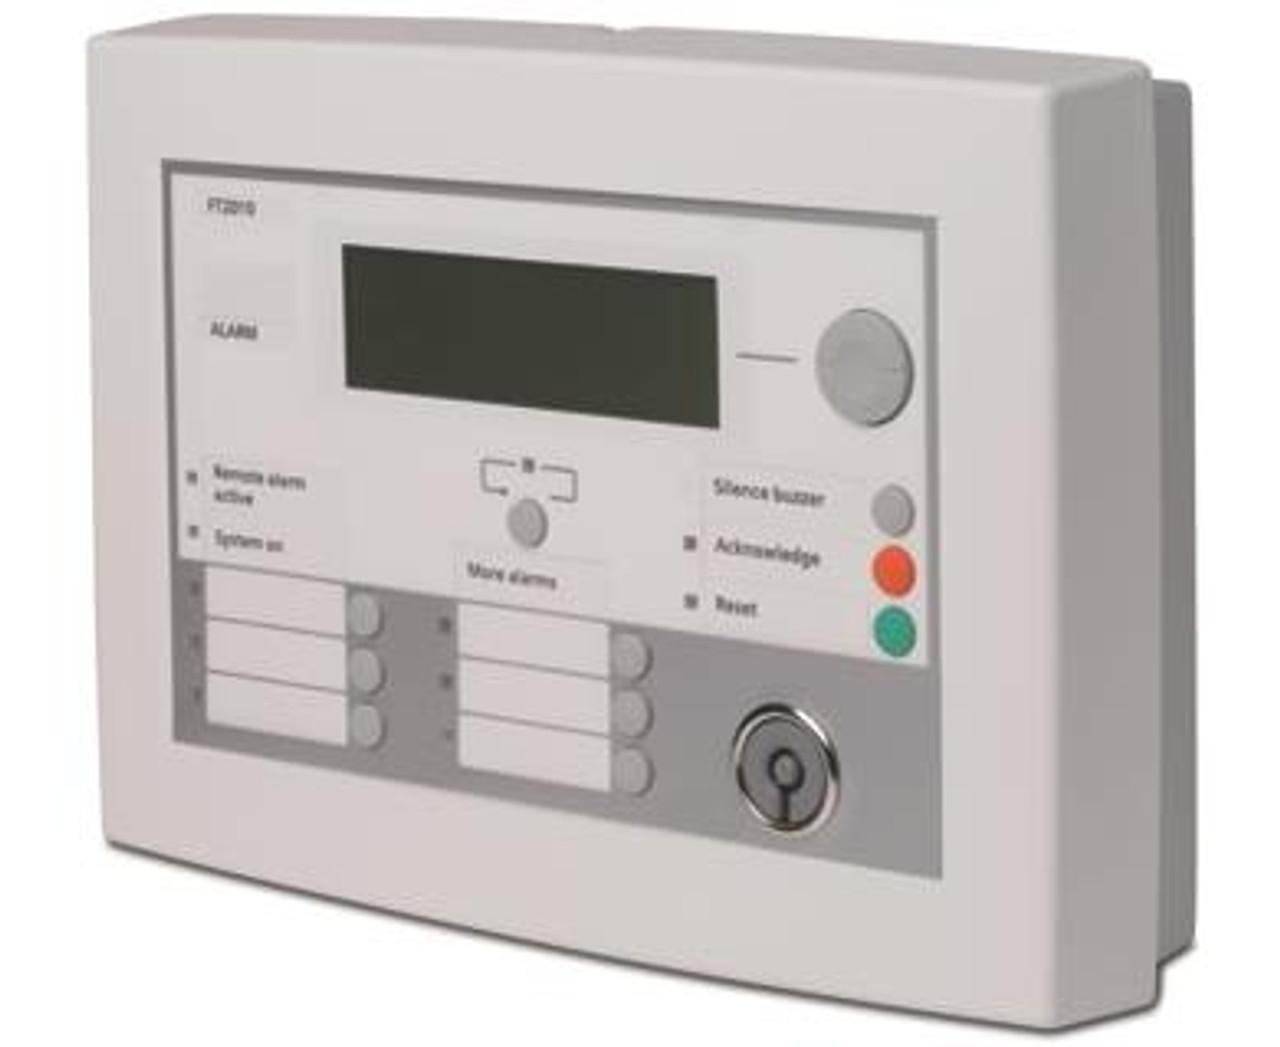 Siemens FT2010-A1, A5Q00014104, Floor repeater terminal